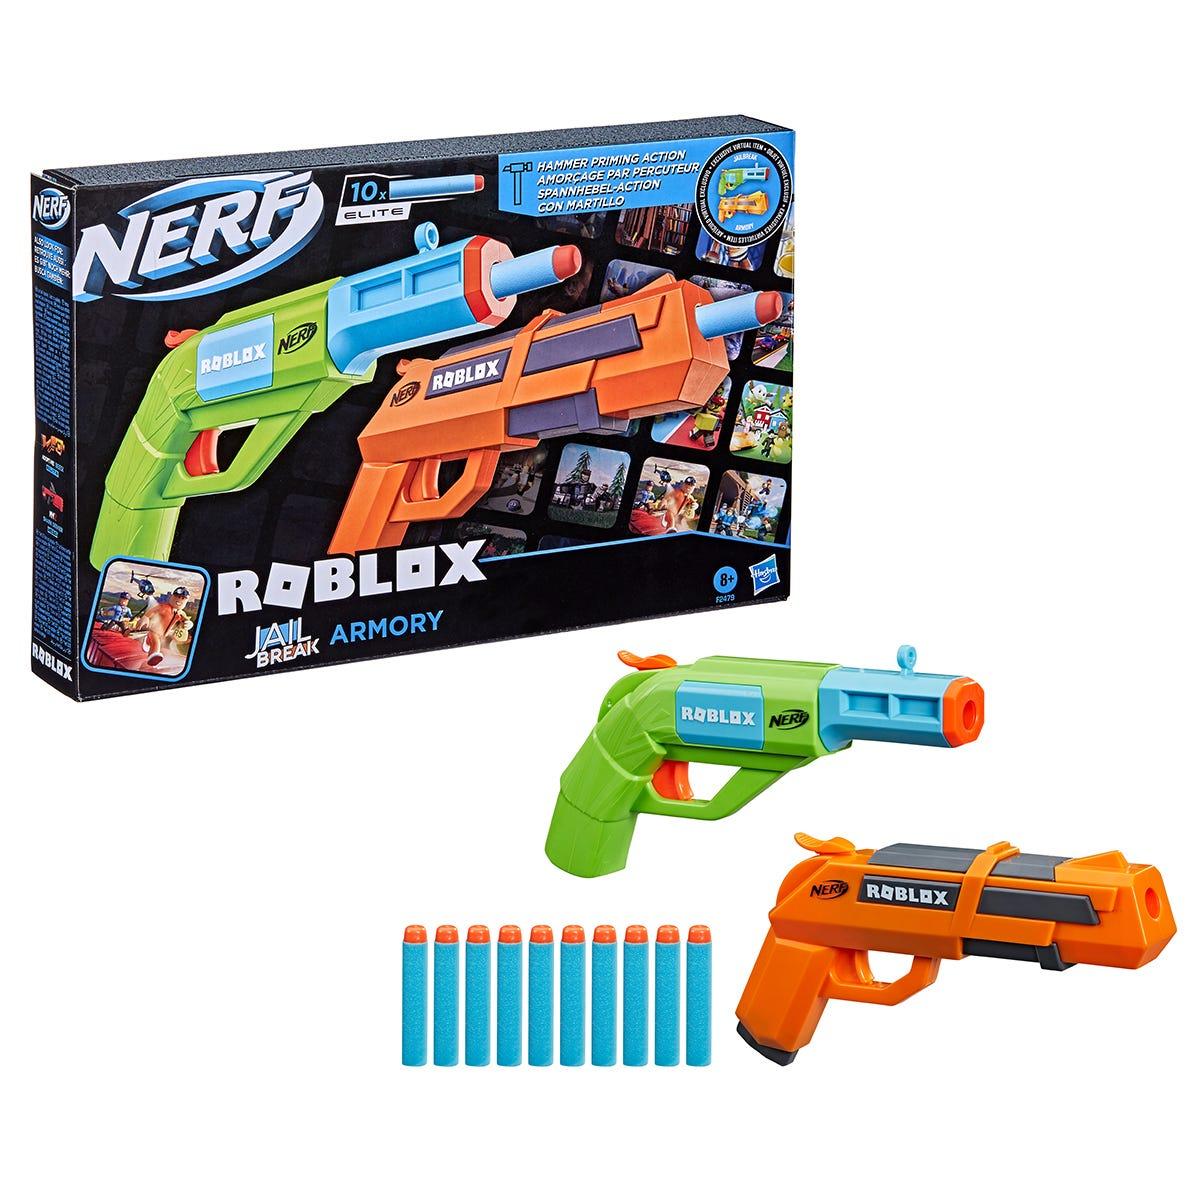 Nerf Roblox Jailbreak: Armory Includes 2 Blasters & 10 Nerf Darts